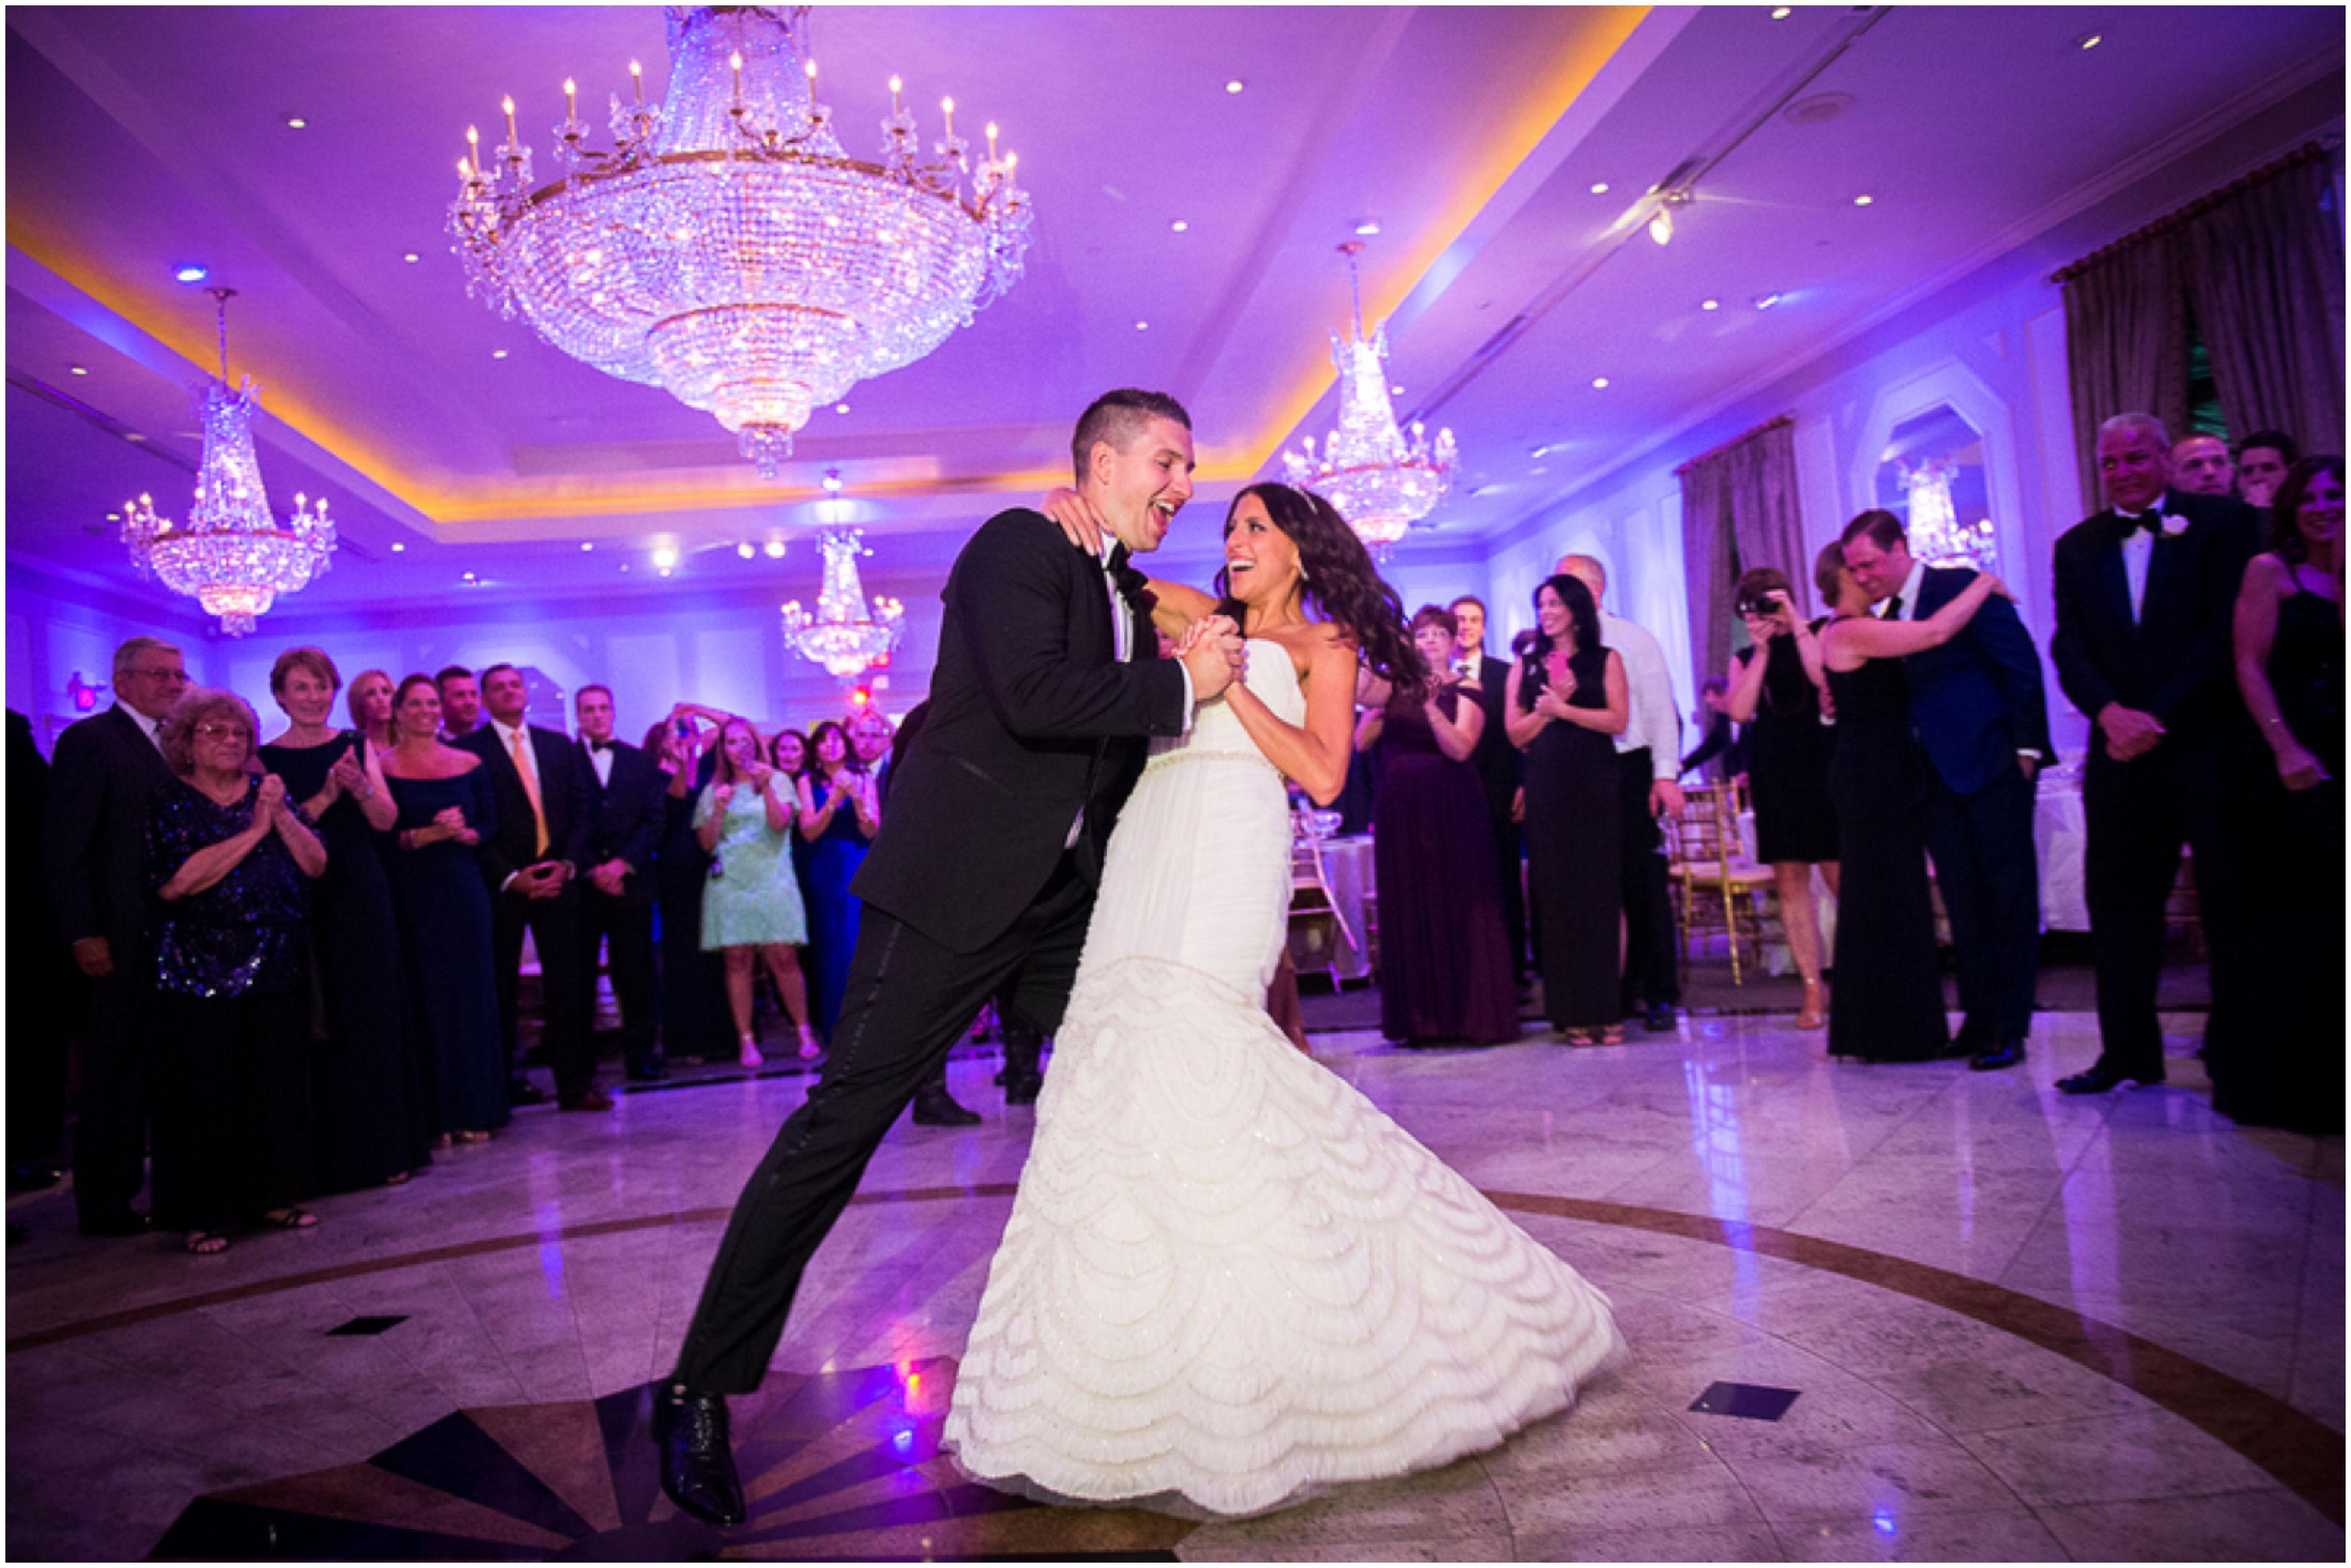 black white purple wedding reception%0A   Purple Wedding Reception Pictures      Best Free Home Design Idea  u      Inspiration